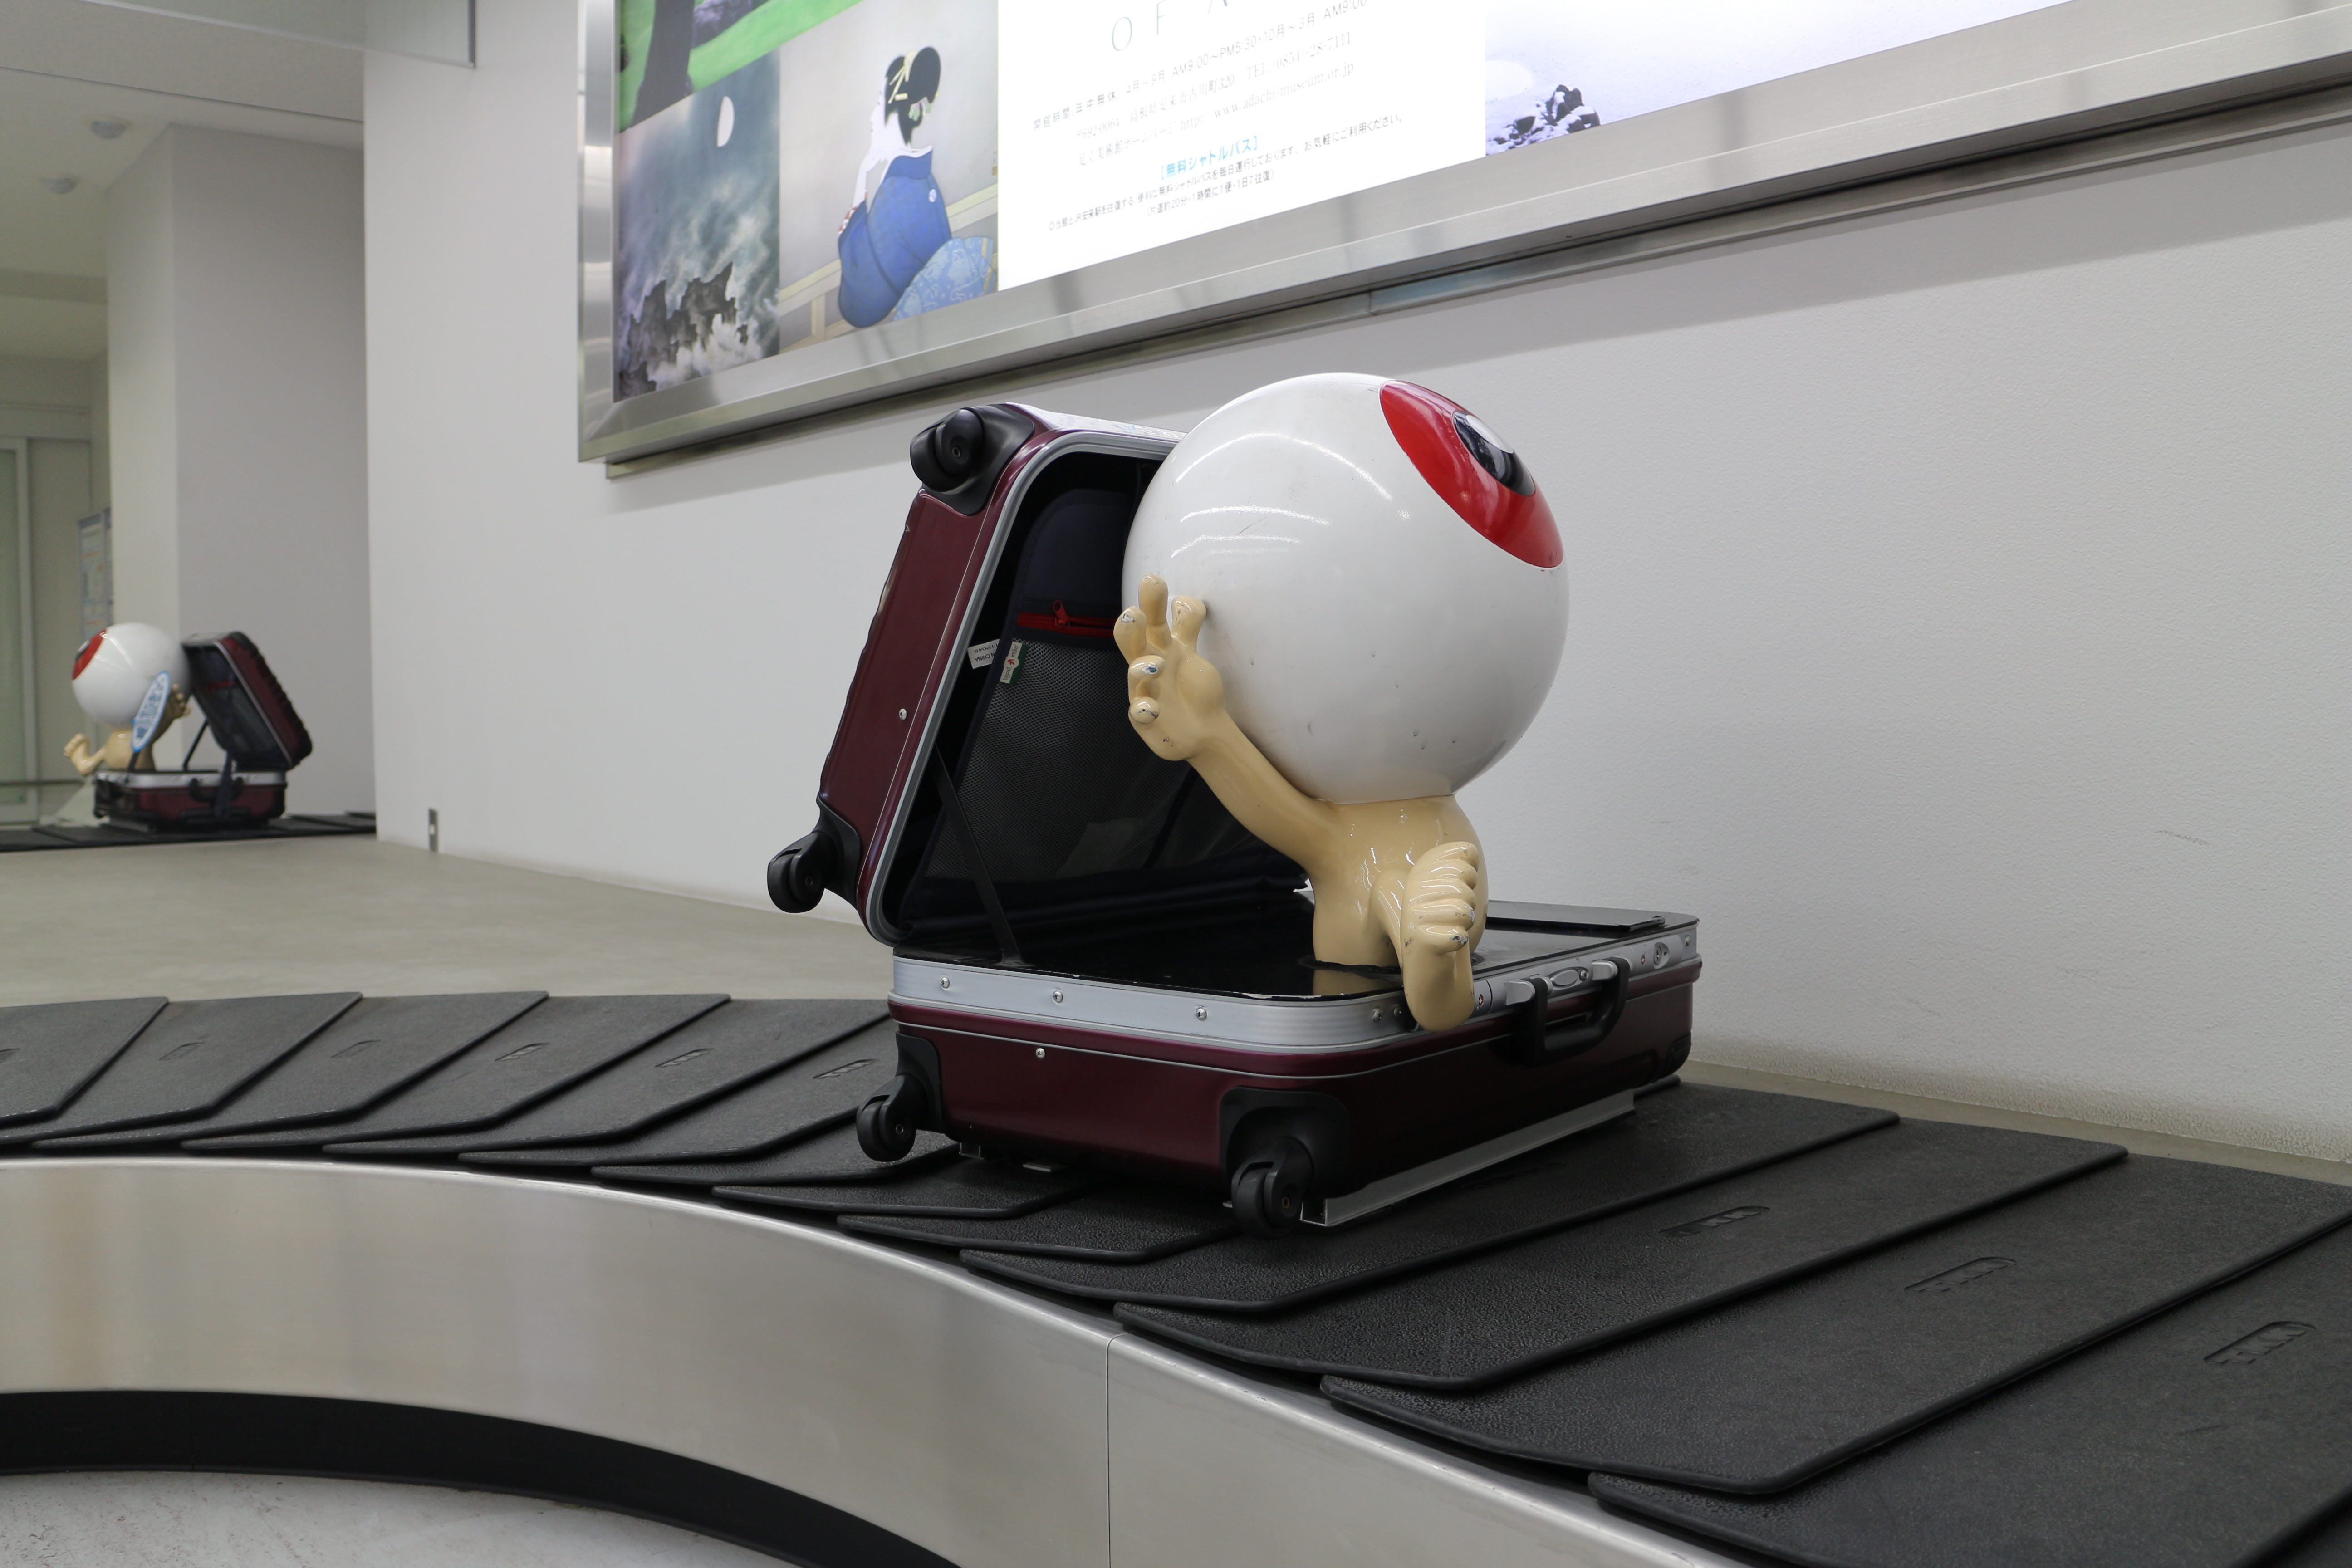 Medama-oyaji statue on luggage carousel at Yonago airport.